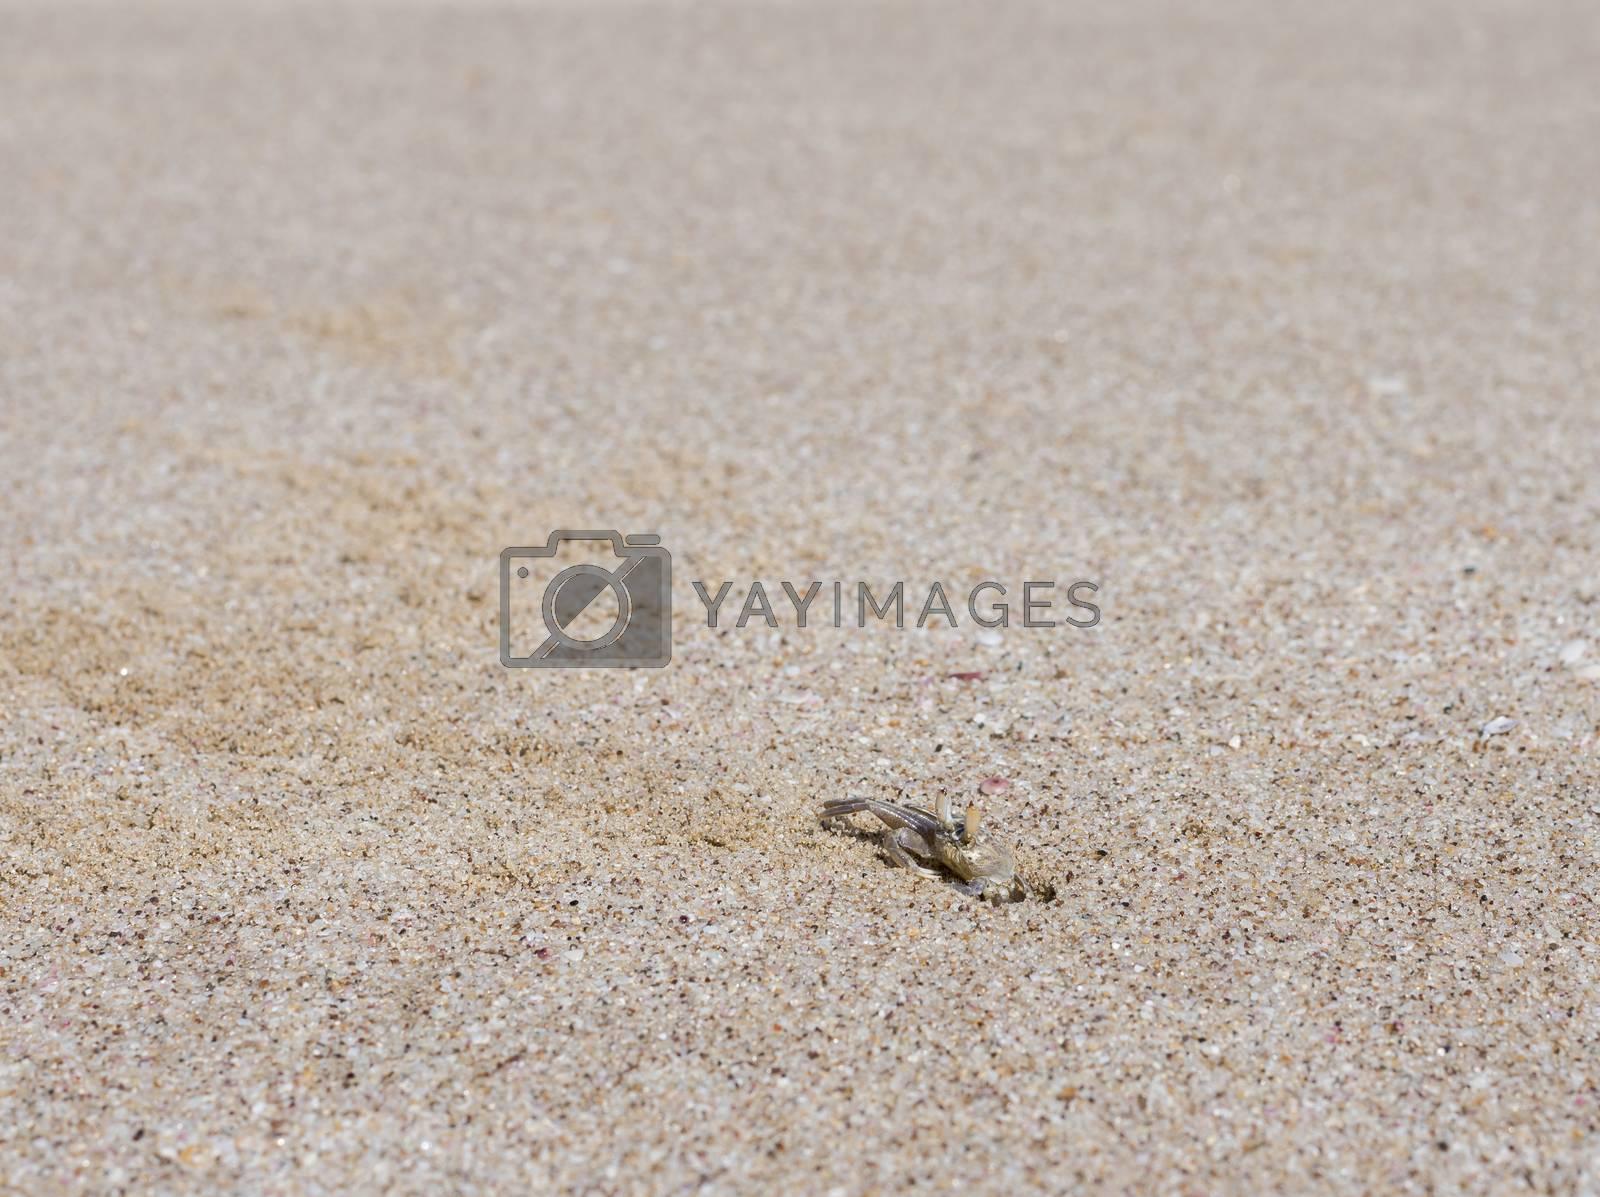 Ghost crab on a beach in Ras Al Jinz, Sultanate of Oman